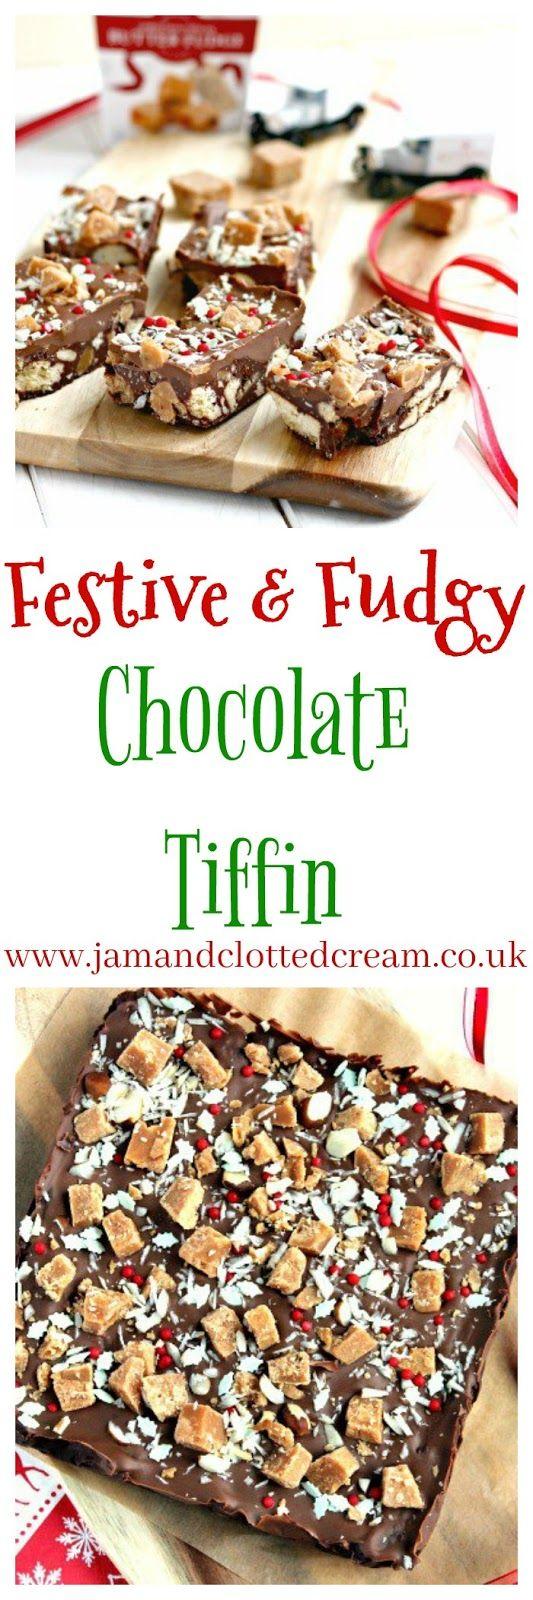 Festive Fudgy Chocolate Tiffin